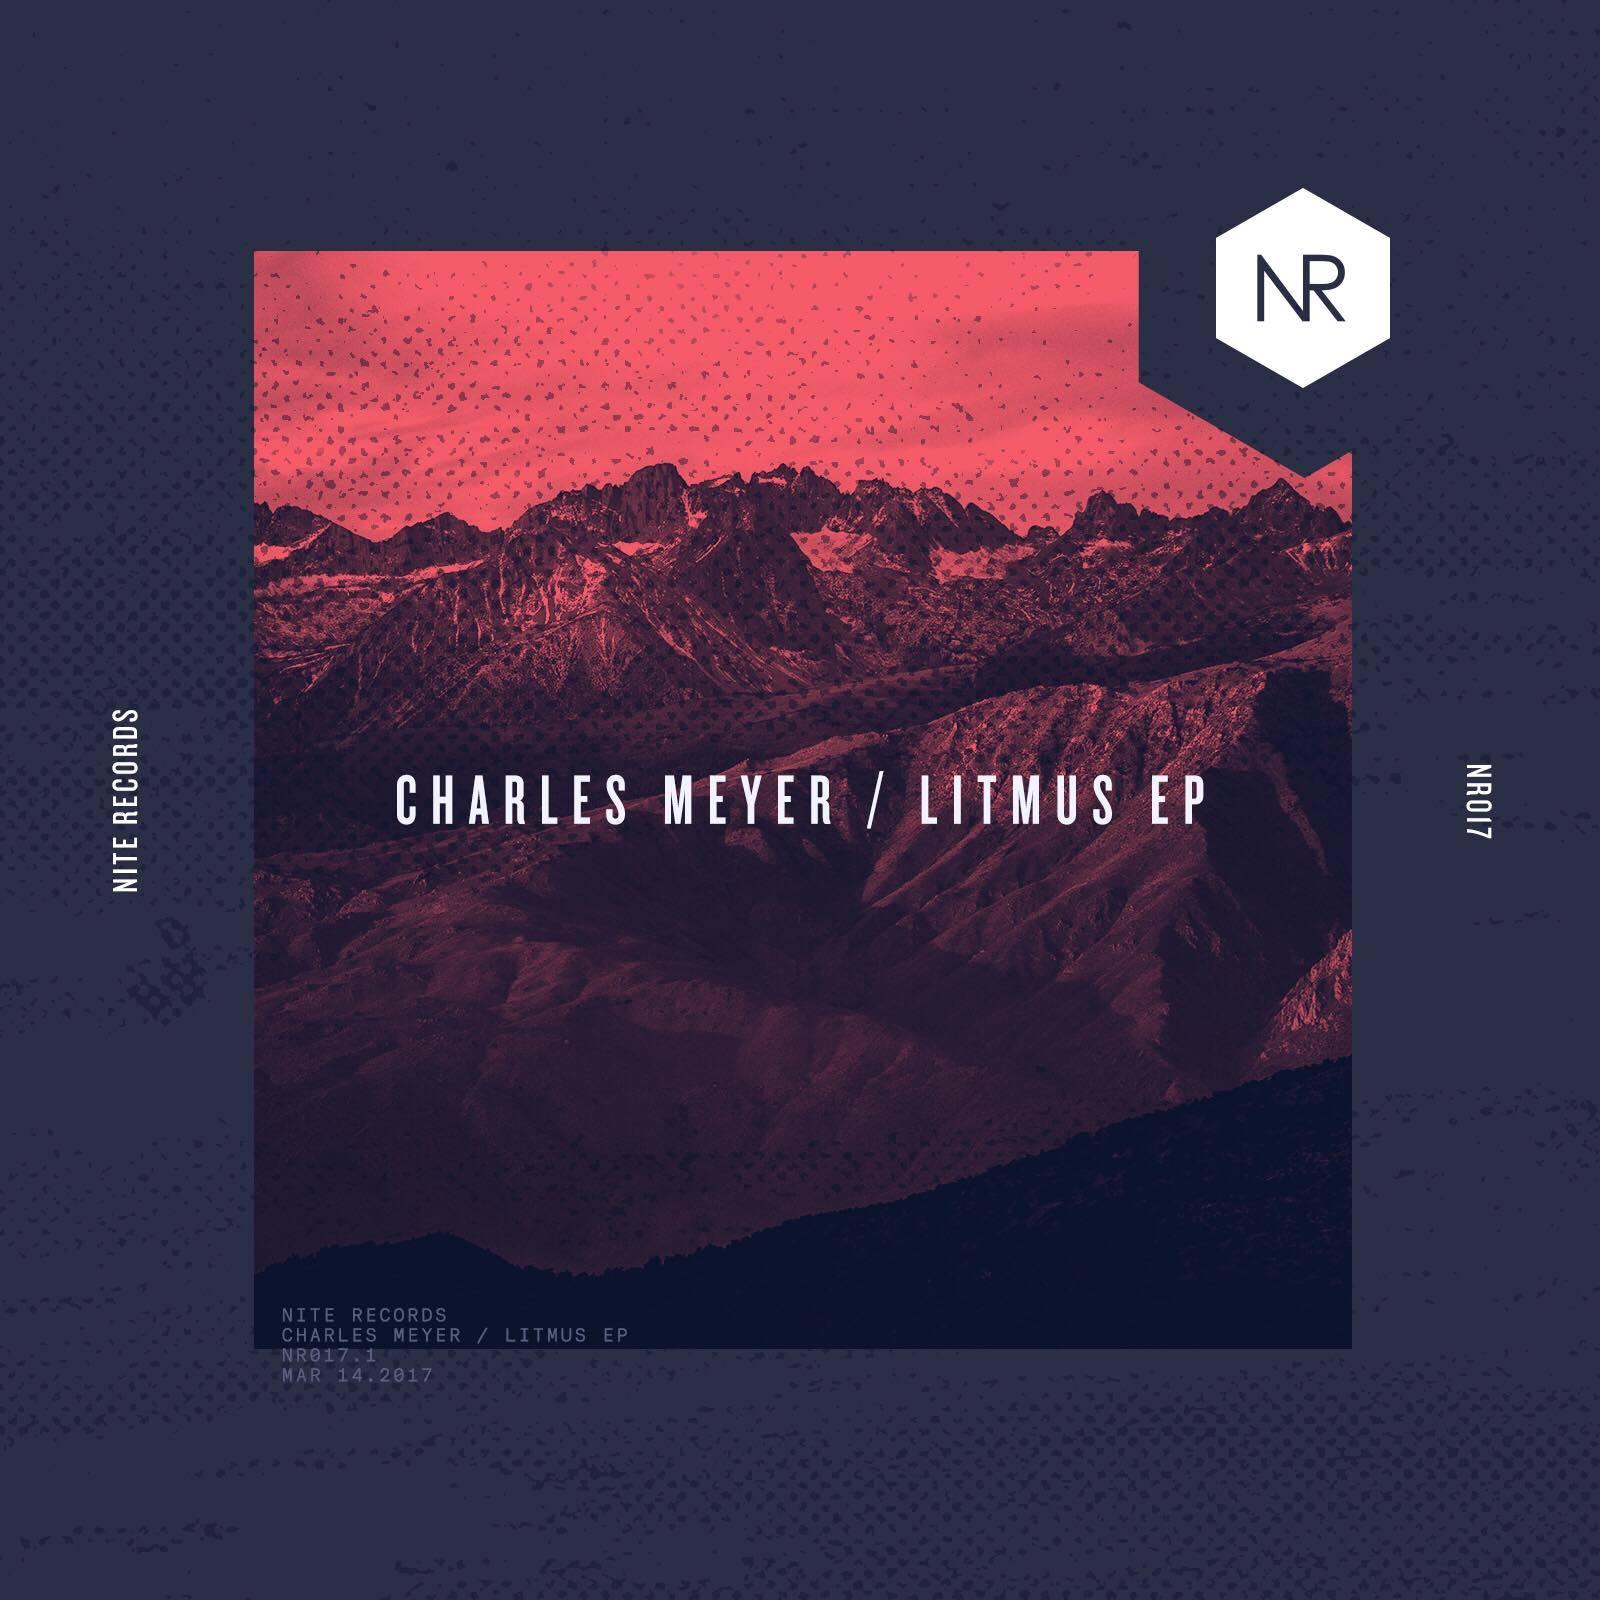 nr017_charles_meyer_litmus_ep.jpg